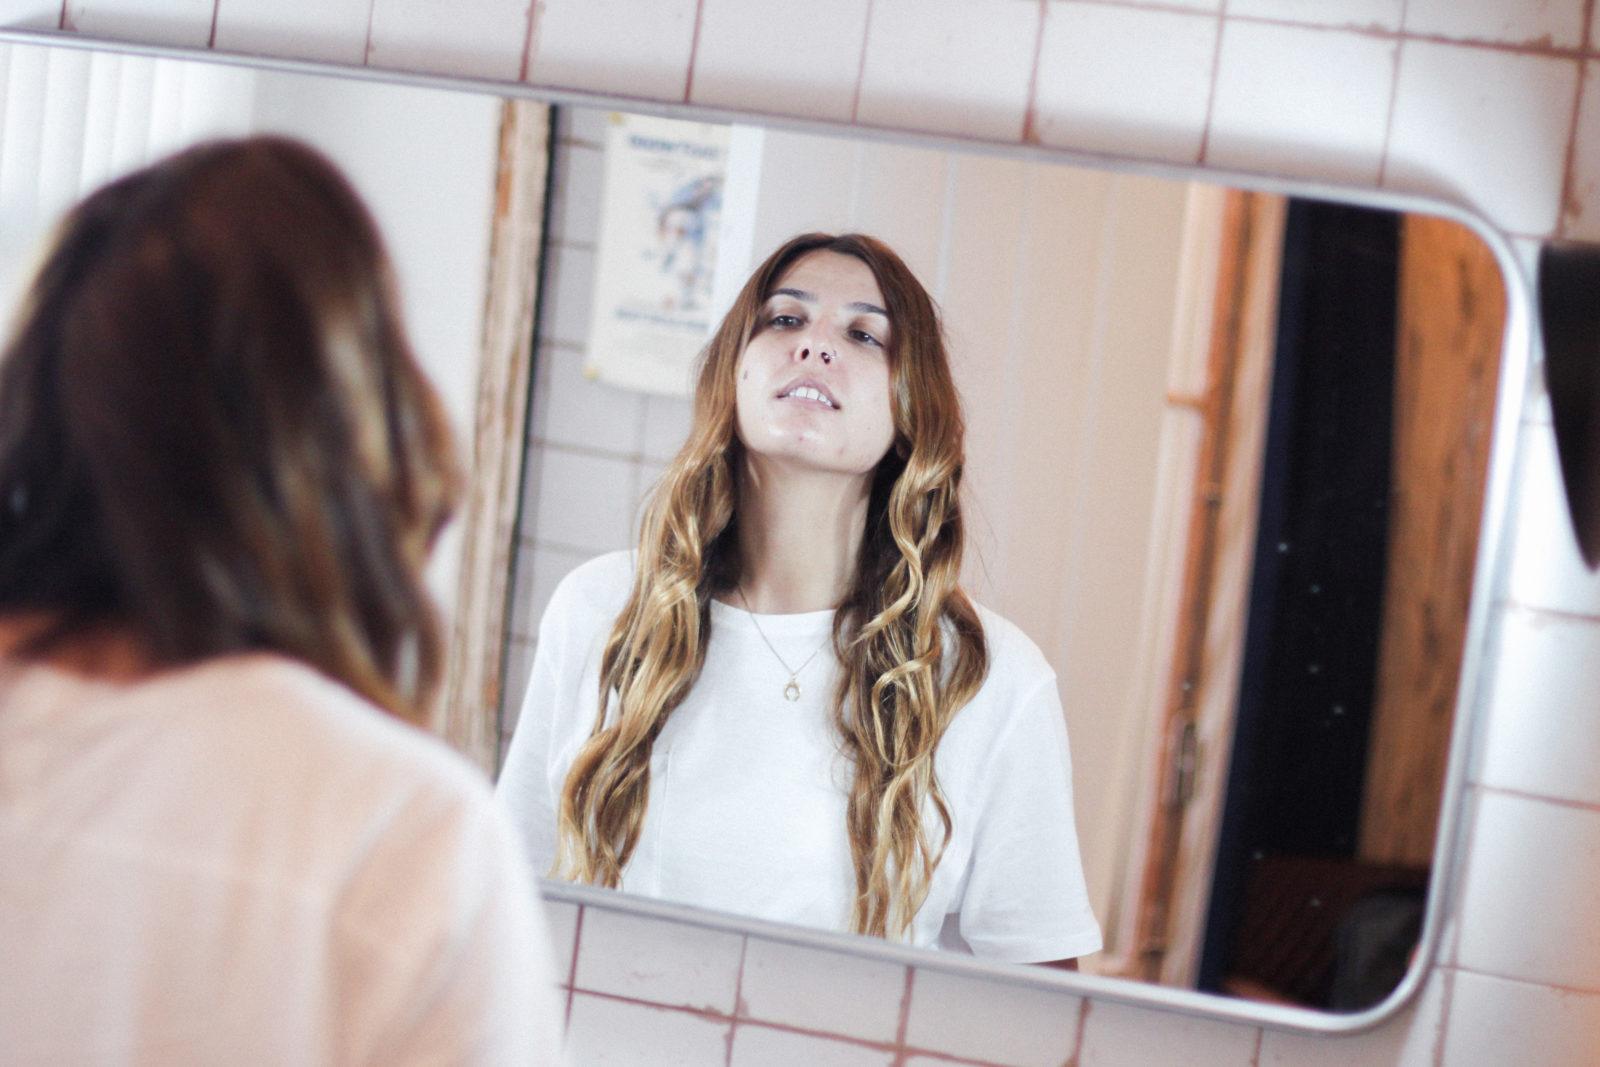 sapphire_curler_irresistibleme_hair_style-30